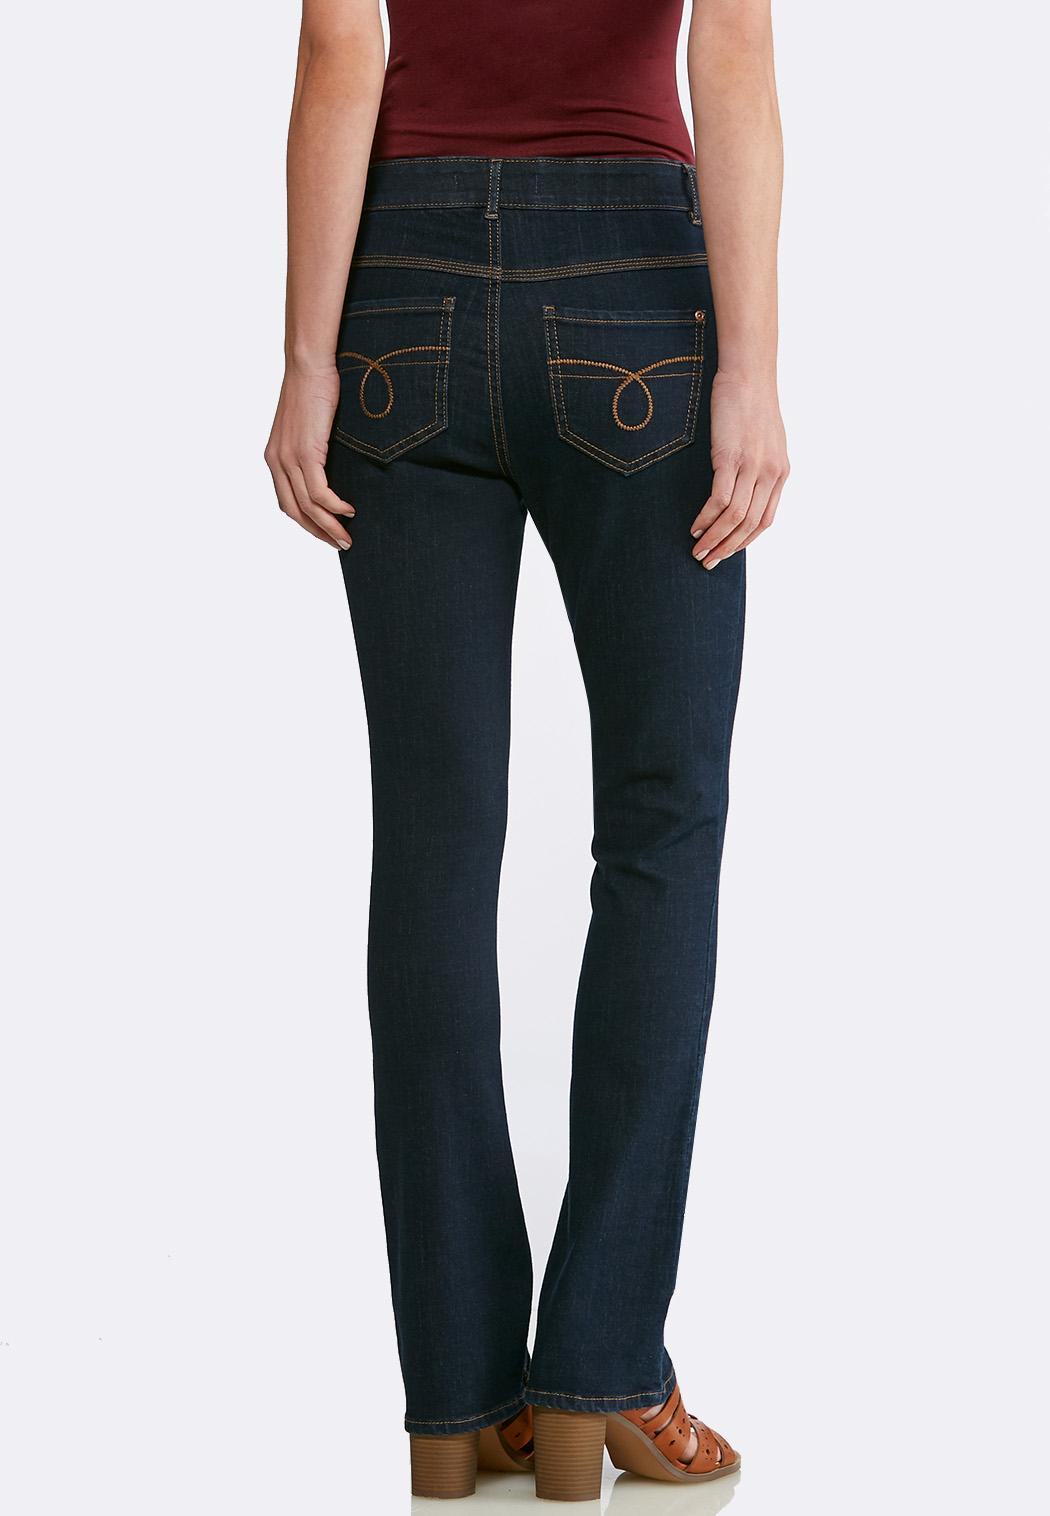 Petite Dark Bootcut Jeans (Item #43639230)